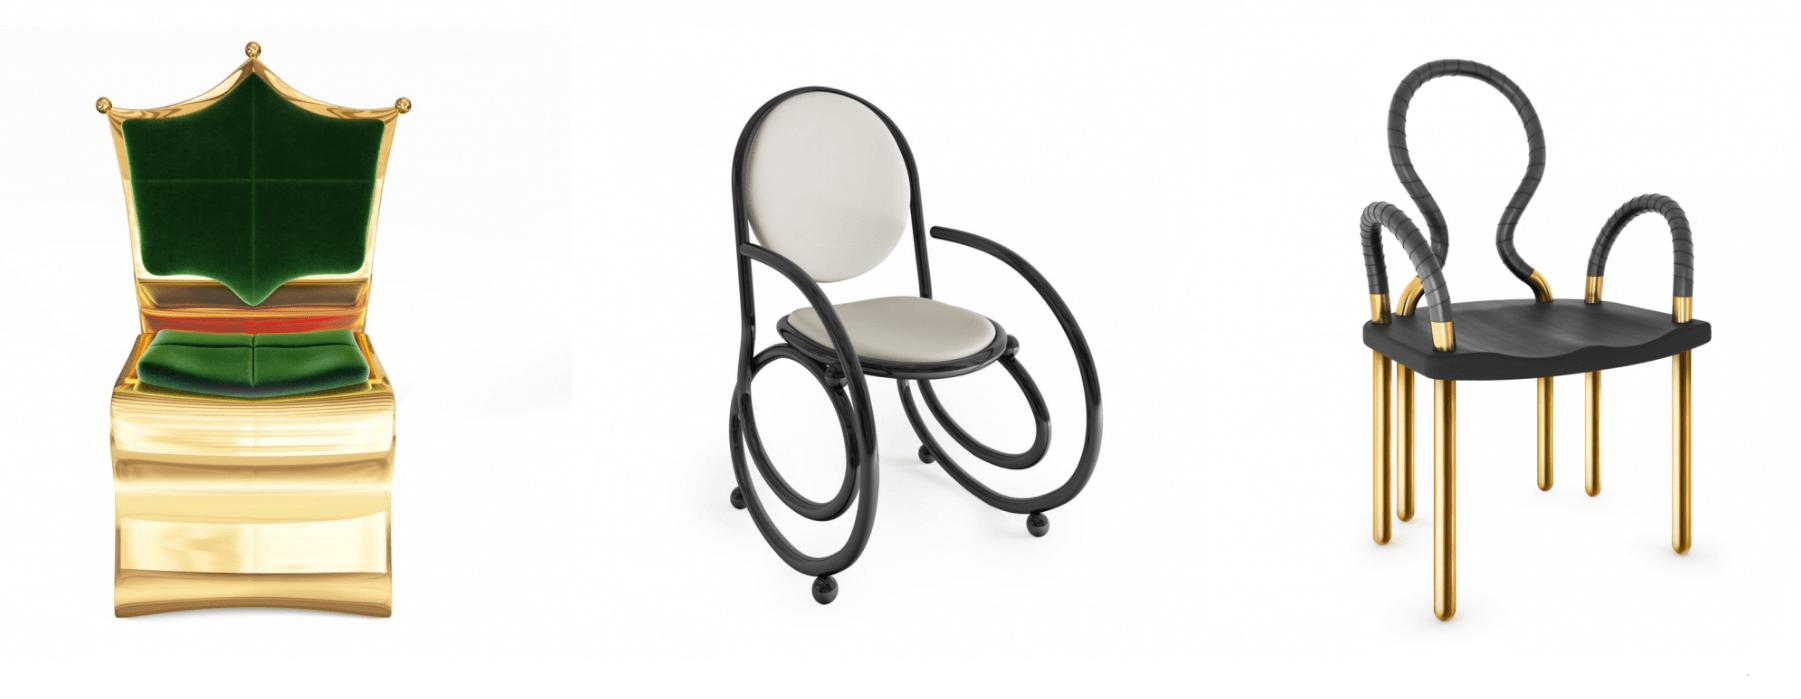 Product Visualization for Furniture Design